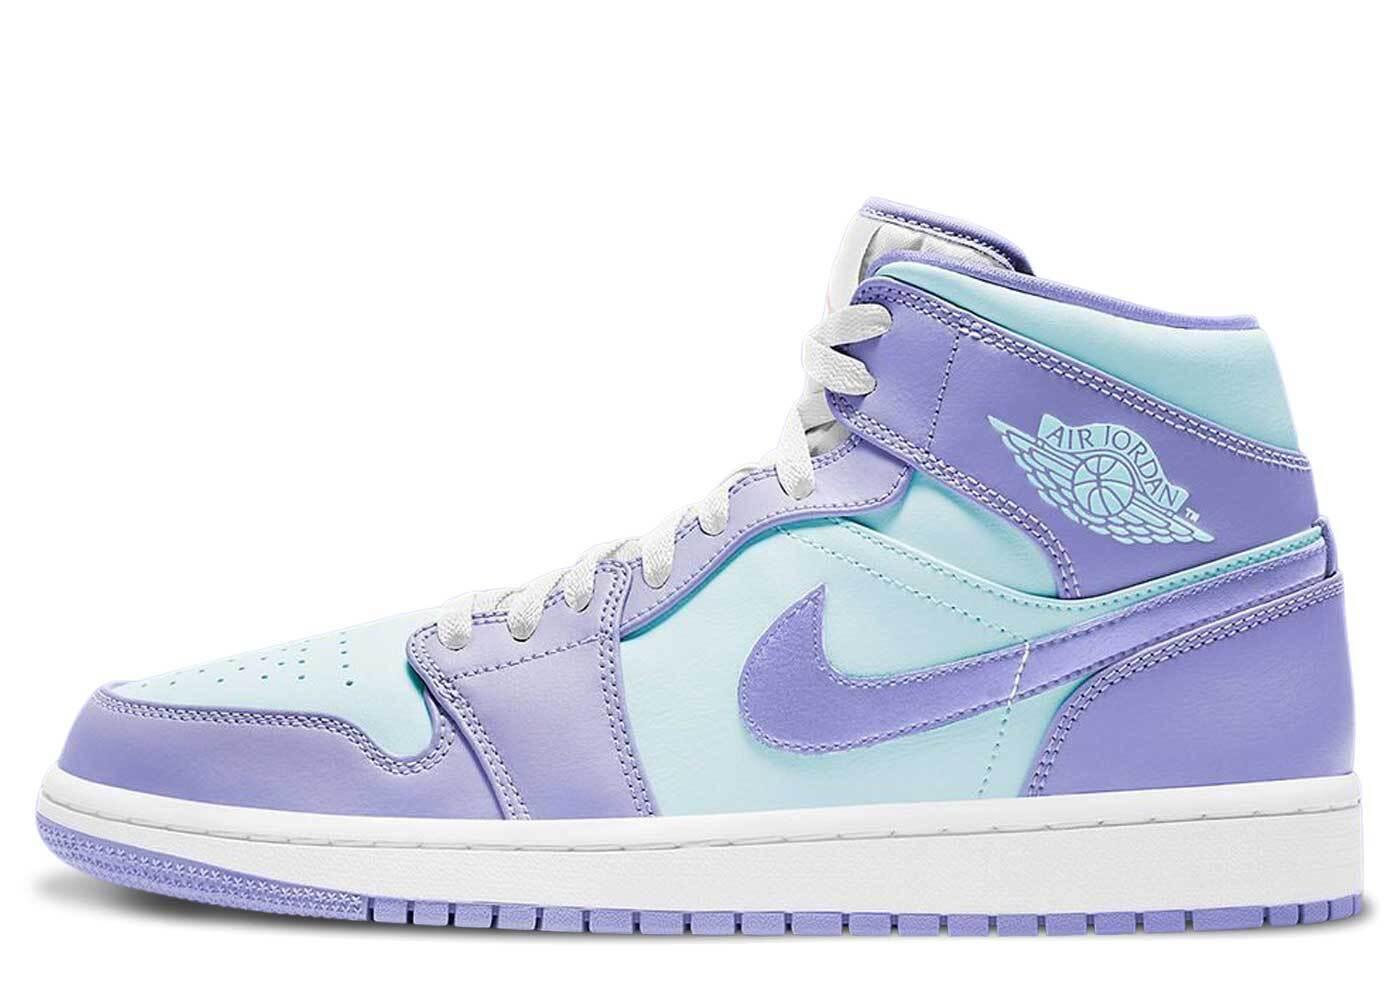 Nike Jordan 1 Mid Aqua Purpleの写真